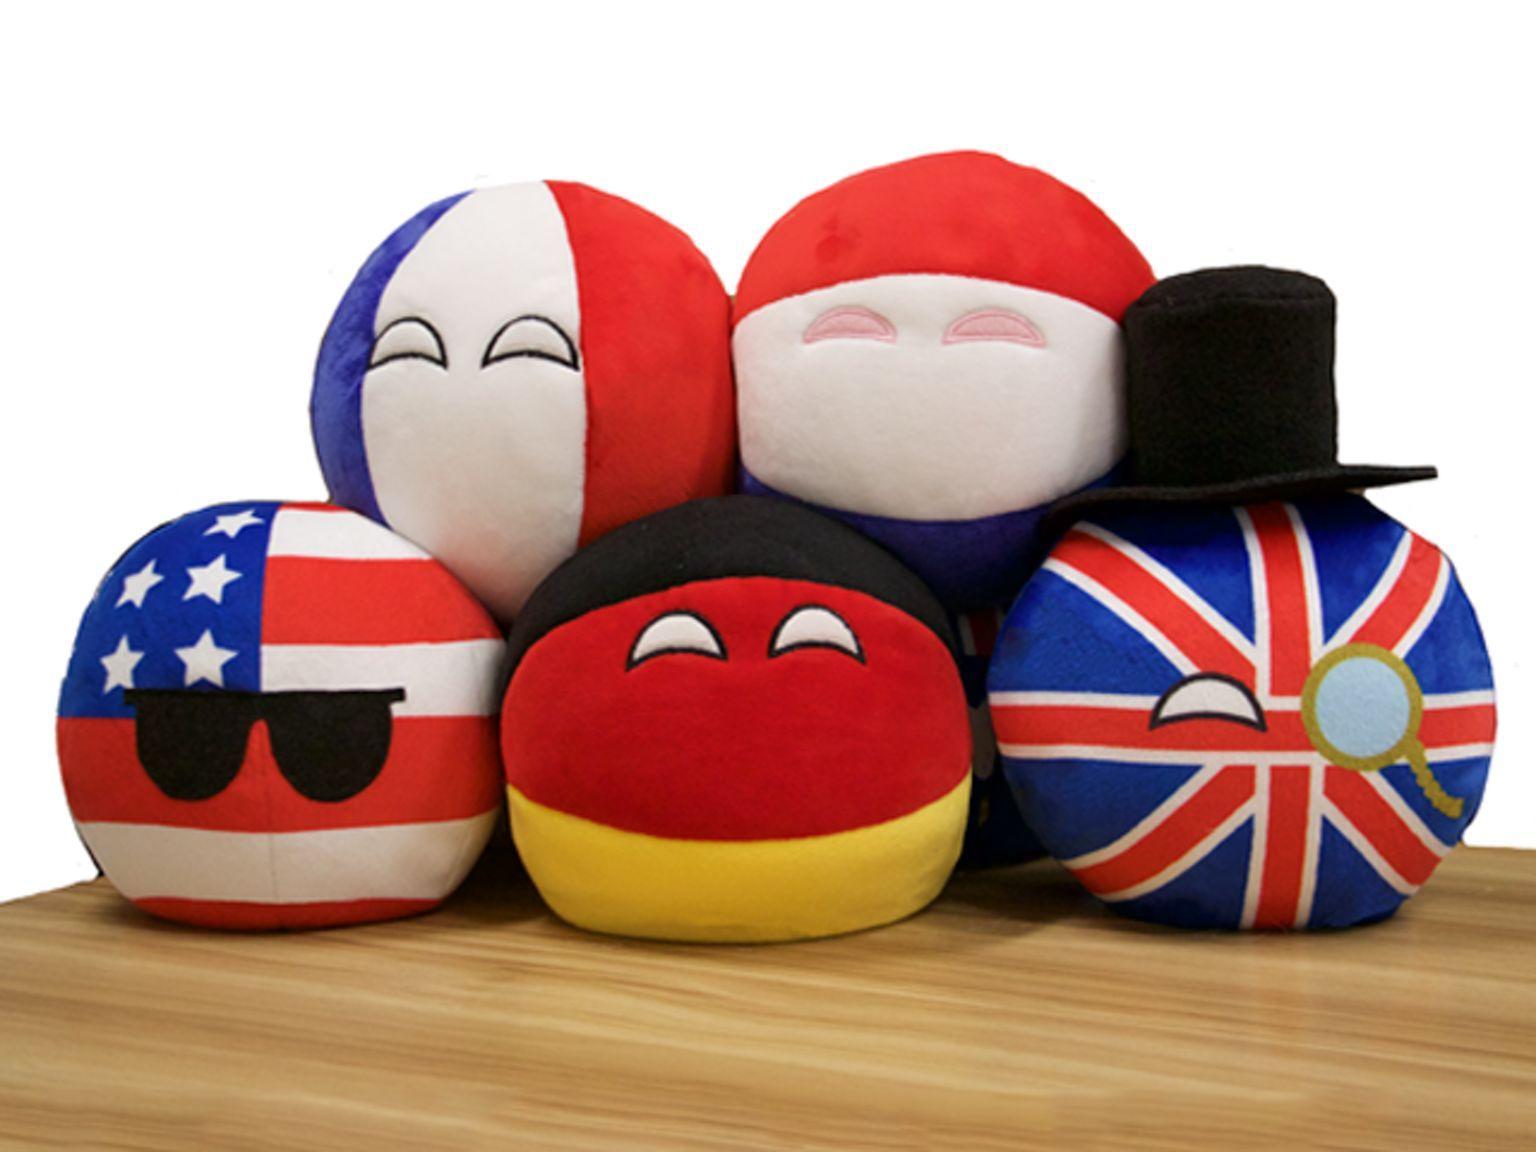 13855 - ¿Cuánto sabes de los countryballs?